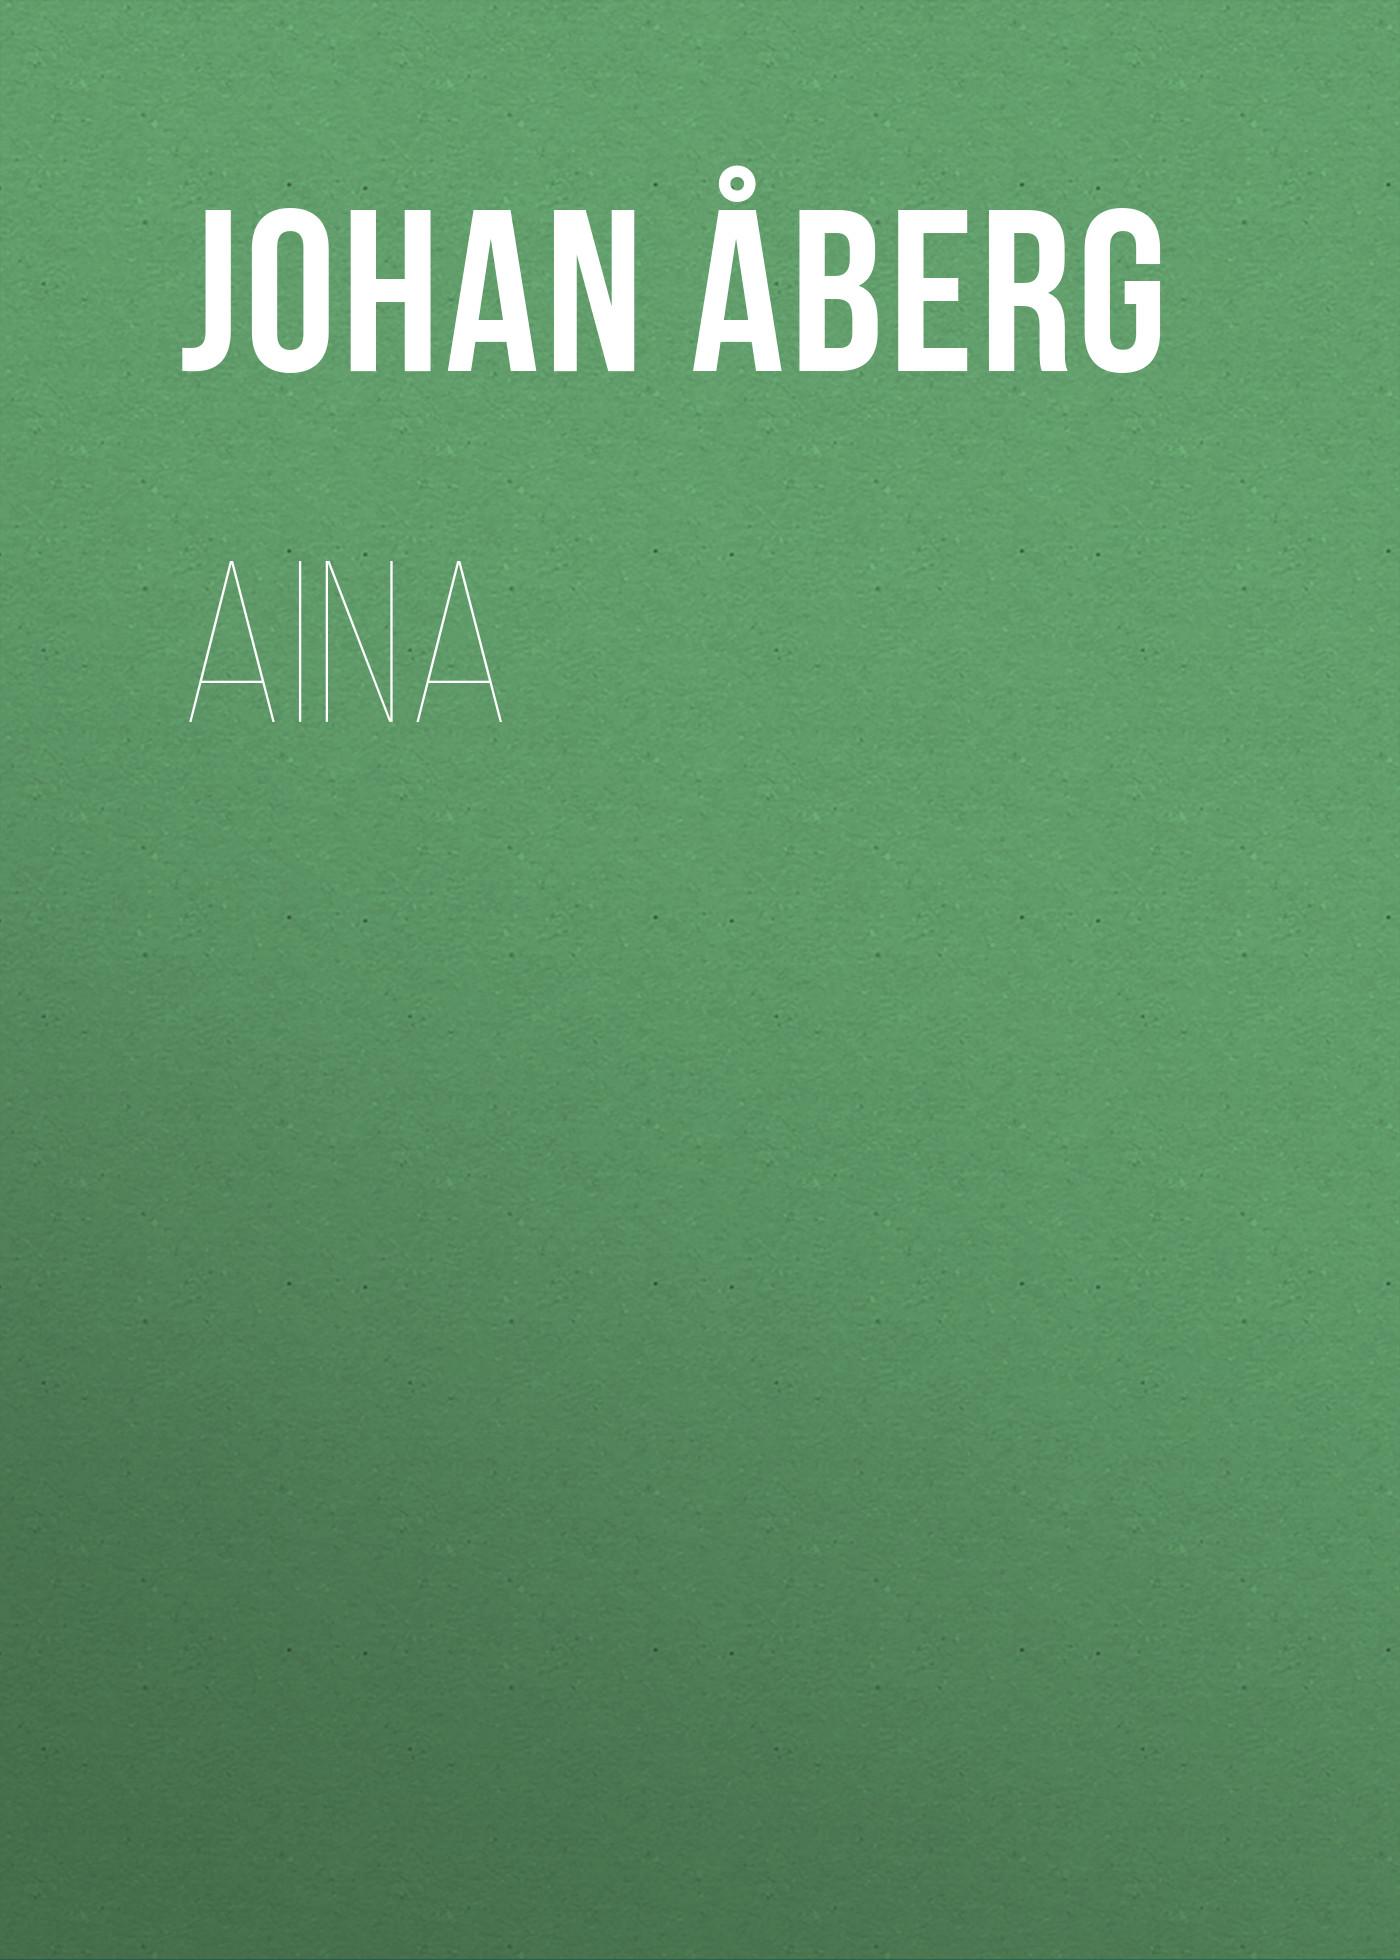 Åberg Johan Olof Aina olof bjoerner olof s files a bob dylan performance guide volume 2 1970 1977